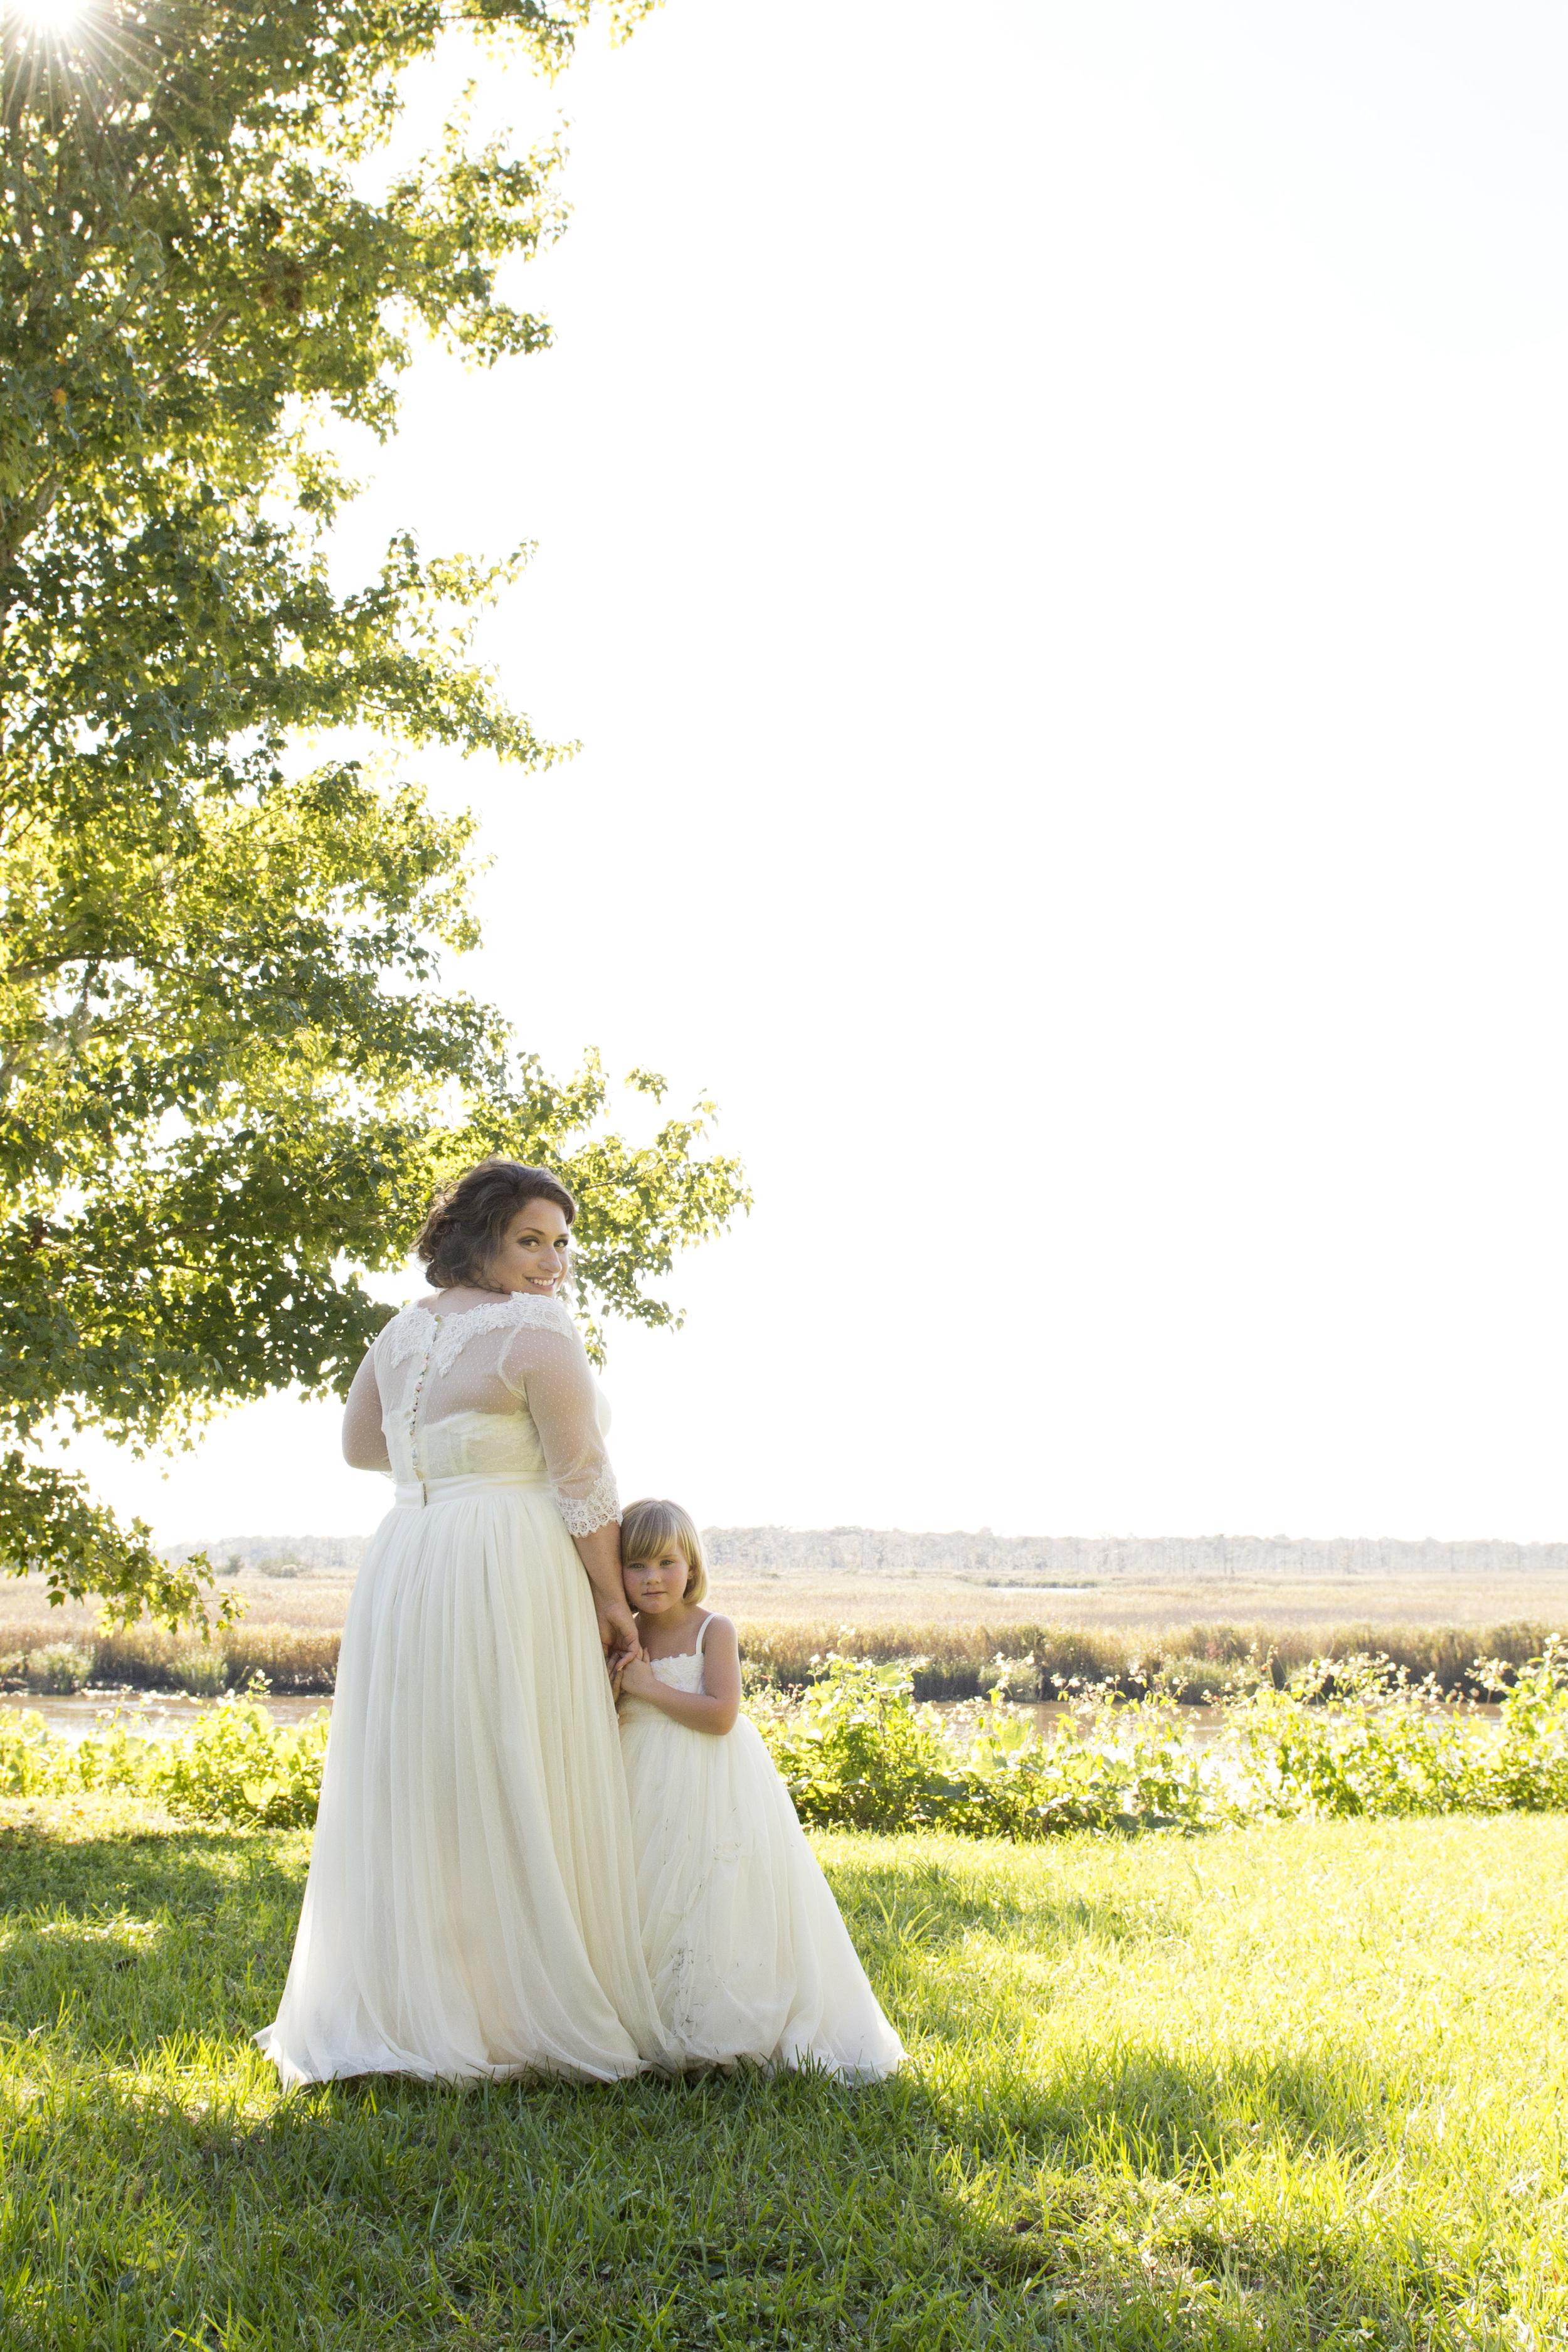 Caroline-Kilgore-photography-ivory-and-beau-bridal-boutique-savannah-wedding-dresses-savannah-bridal-boutique-savannah-wedding-gowns-custom-wedding-dress-vintage-wedding-dress-swiss-dot-wedding-dress-shrimp-boat-wedding-2.jpg